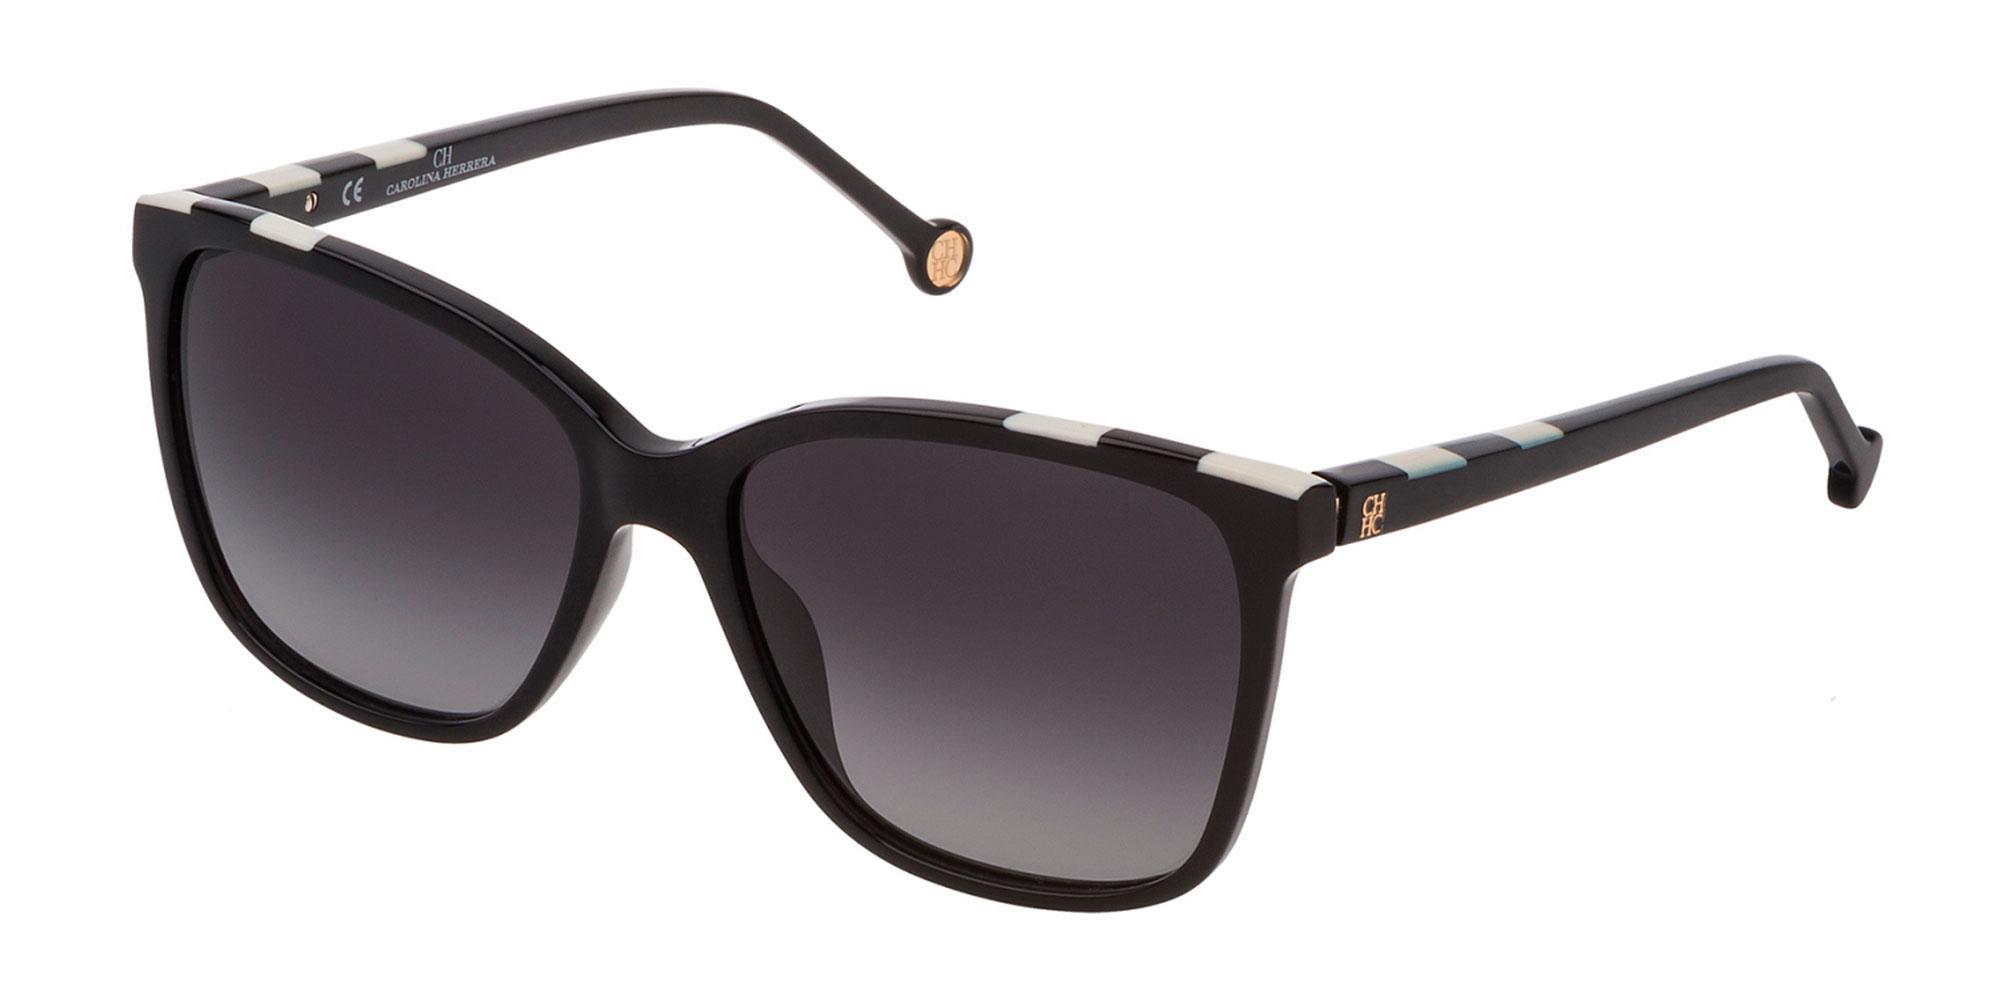 0700 SHE795 Sunglasses, CH Carolina Herrera